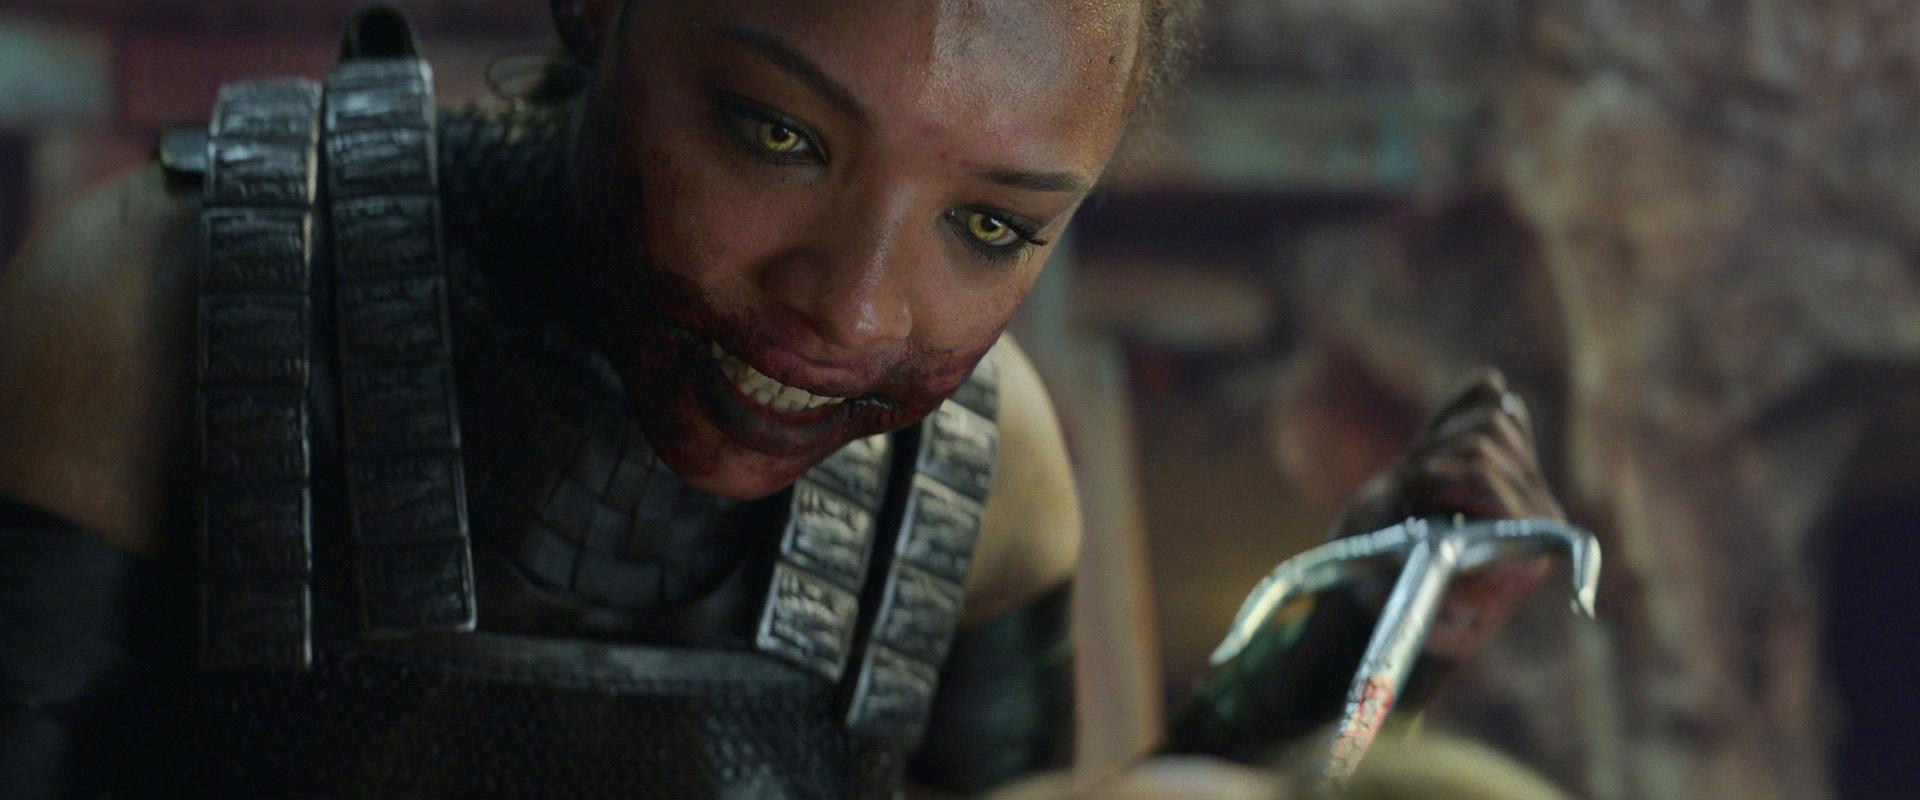 Mortal Kombat | 2021 | WEB-DL | XviD | Türkçe Dublaj | m720p - m1080p | WEB-DL | Tek Link